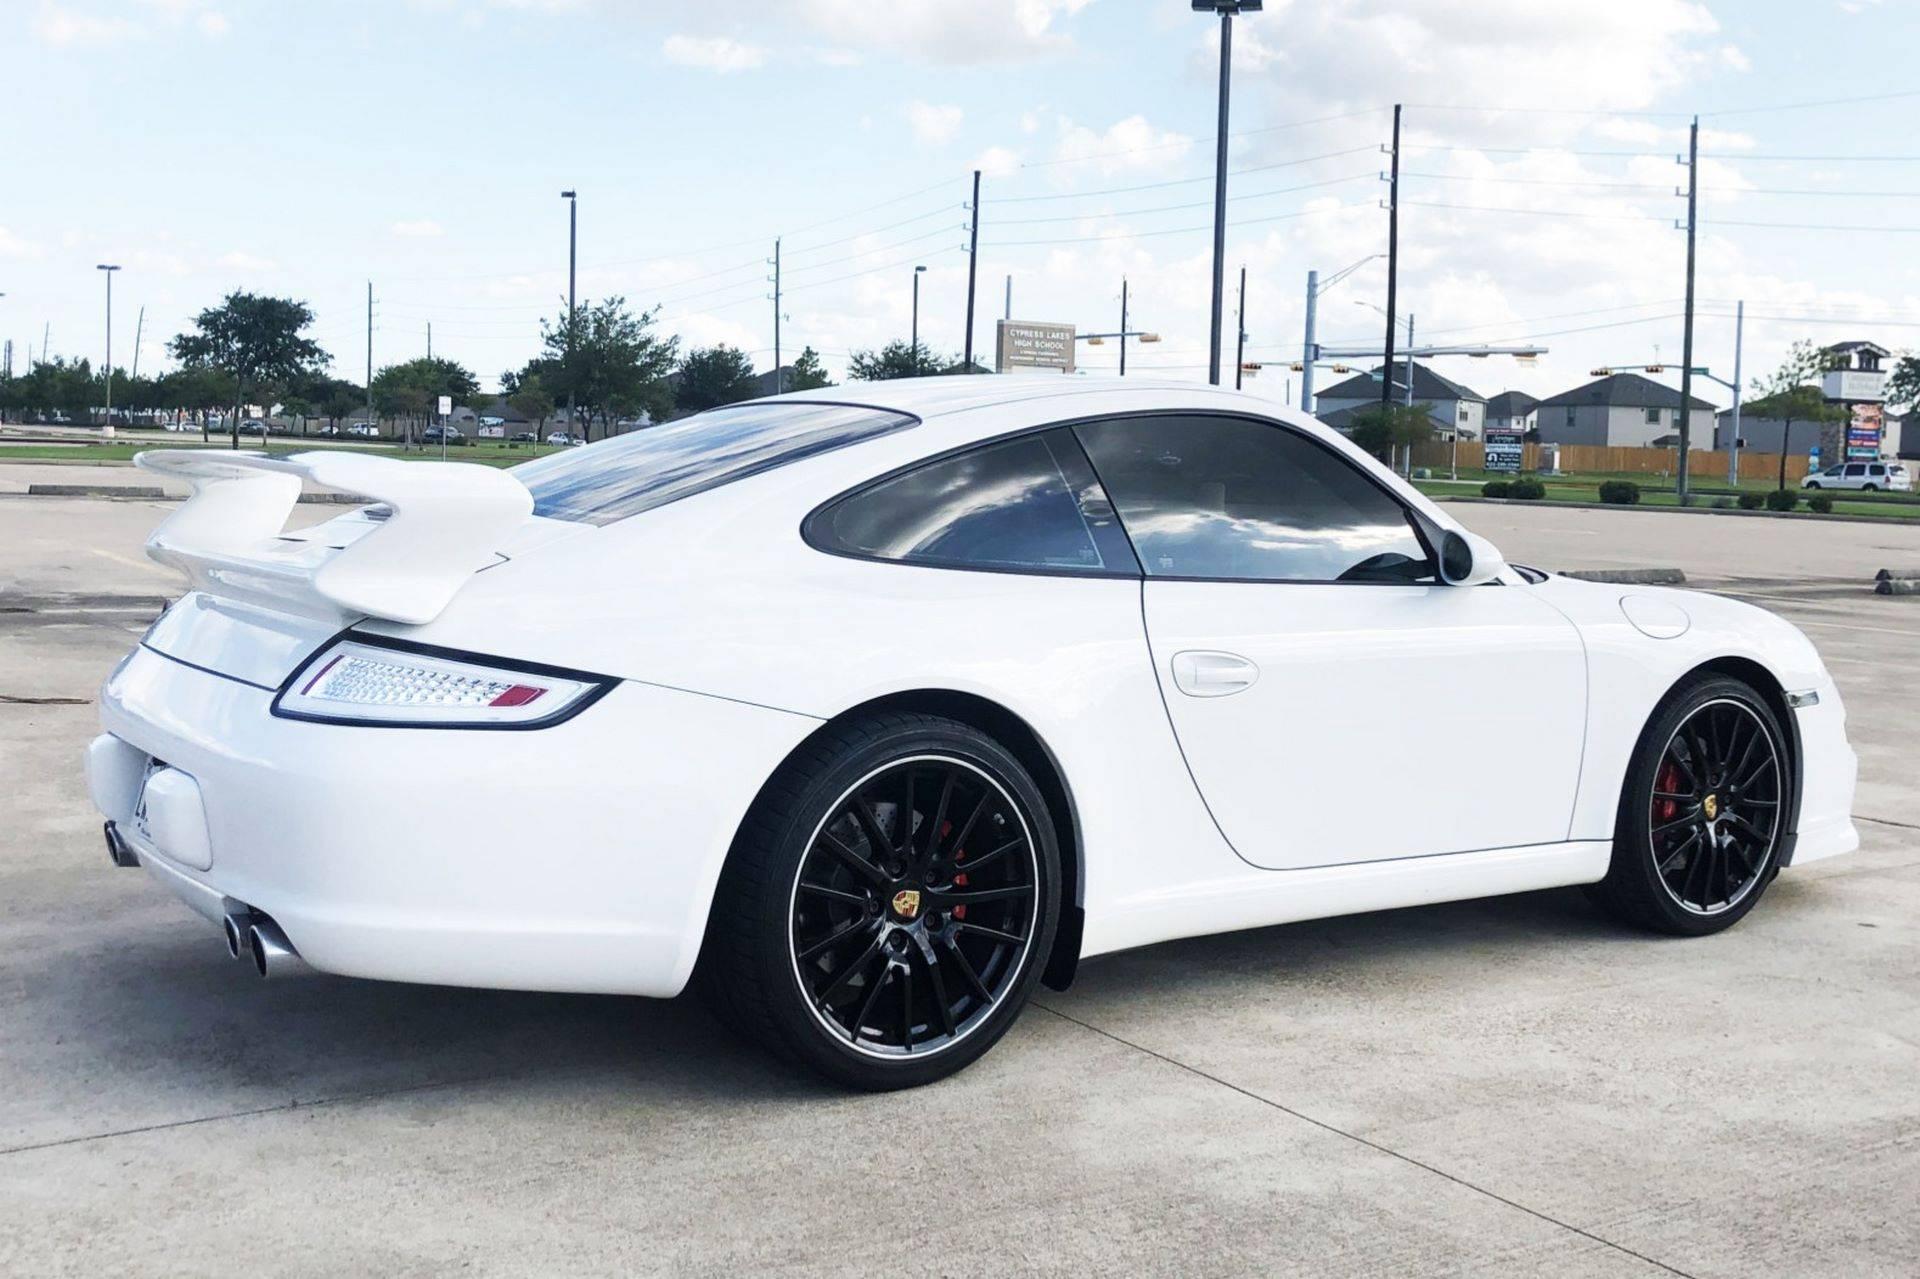 Center-Seat-Porsche-911-Carrera-S-2008-43